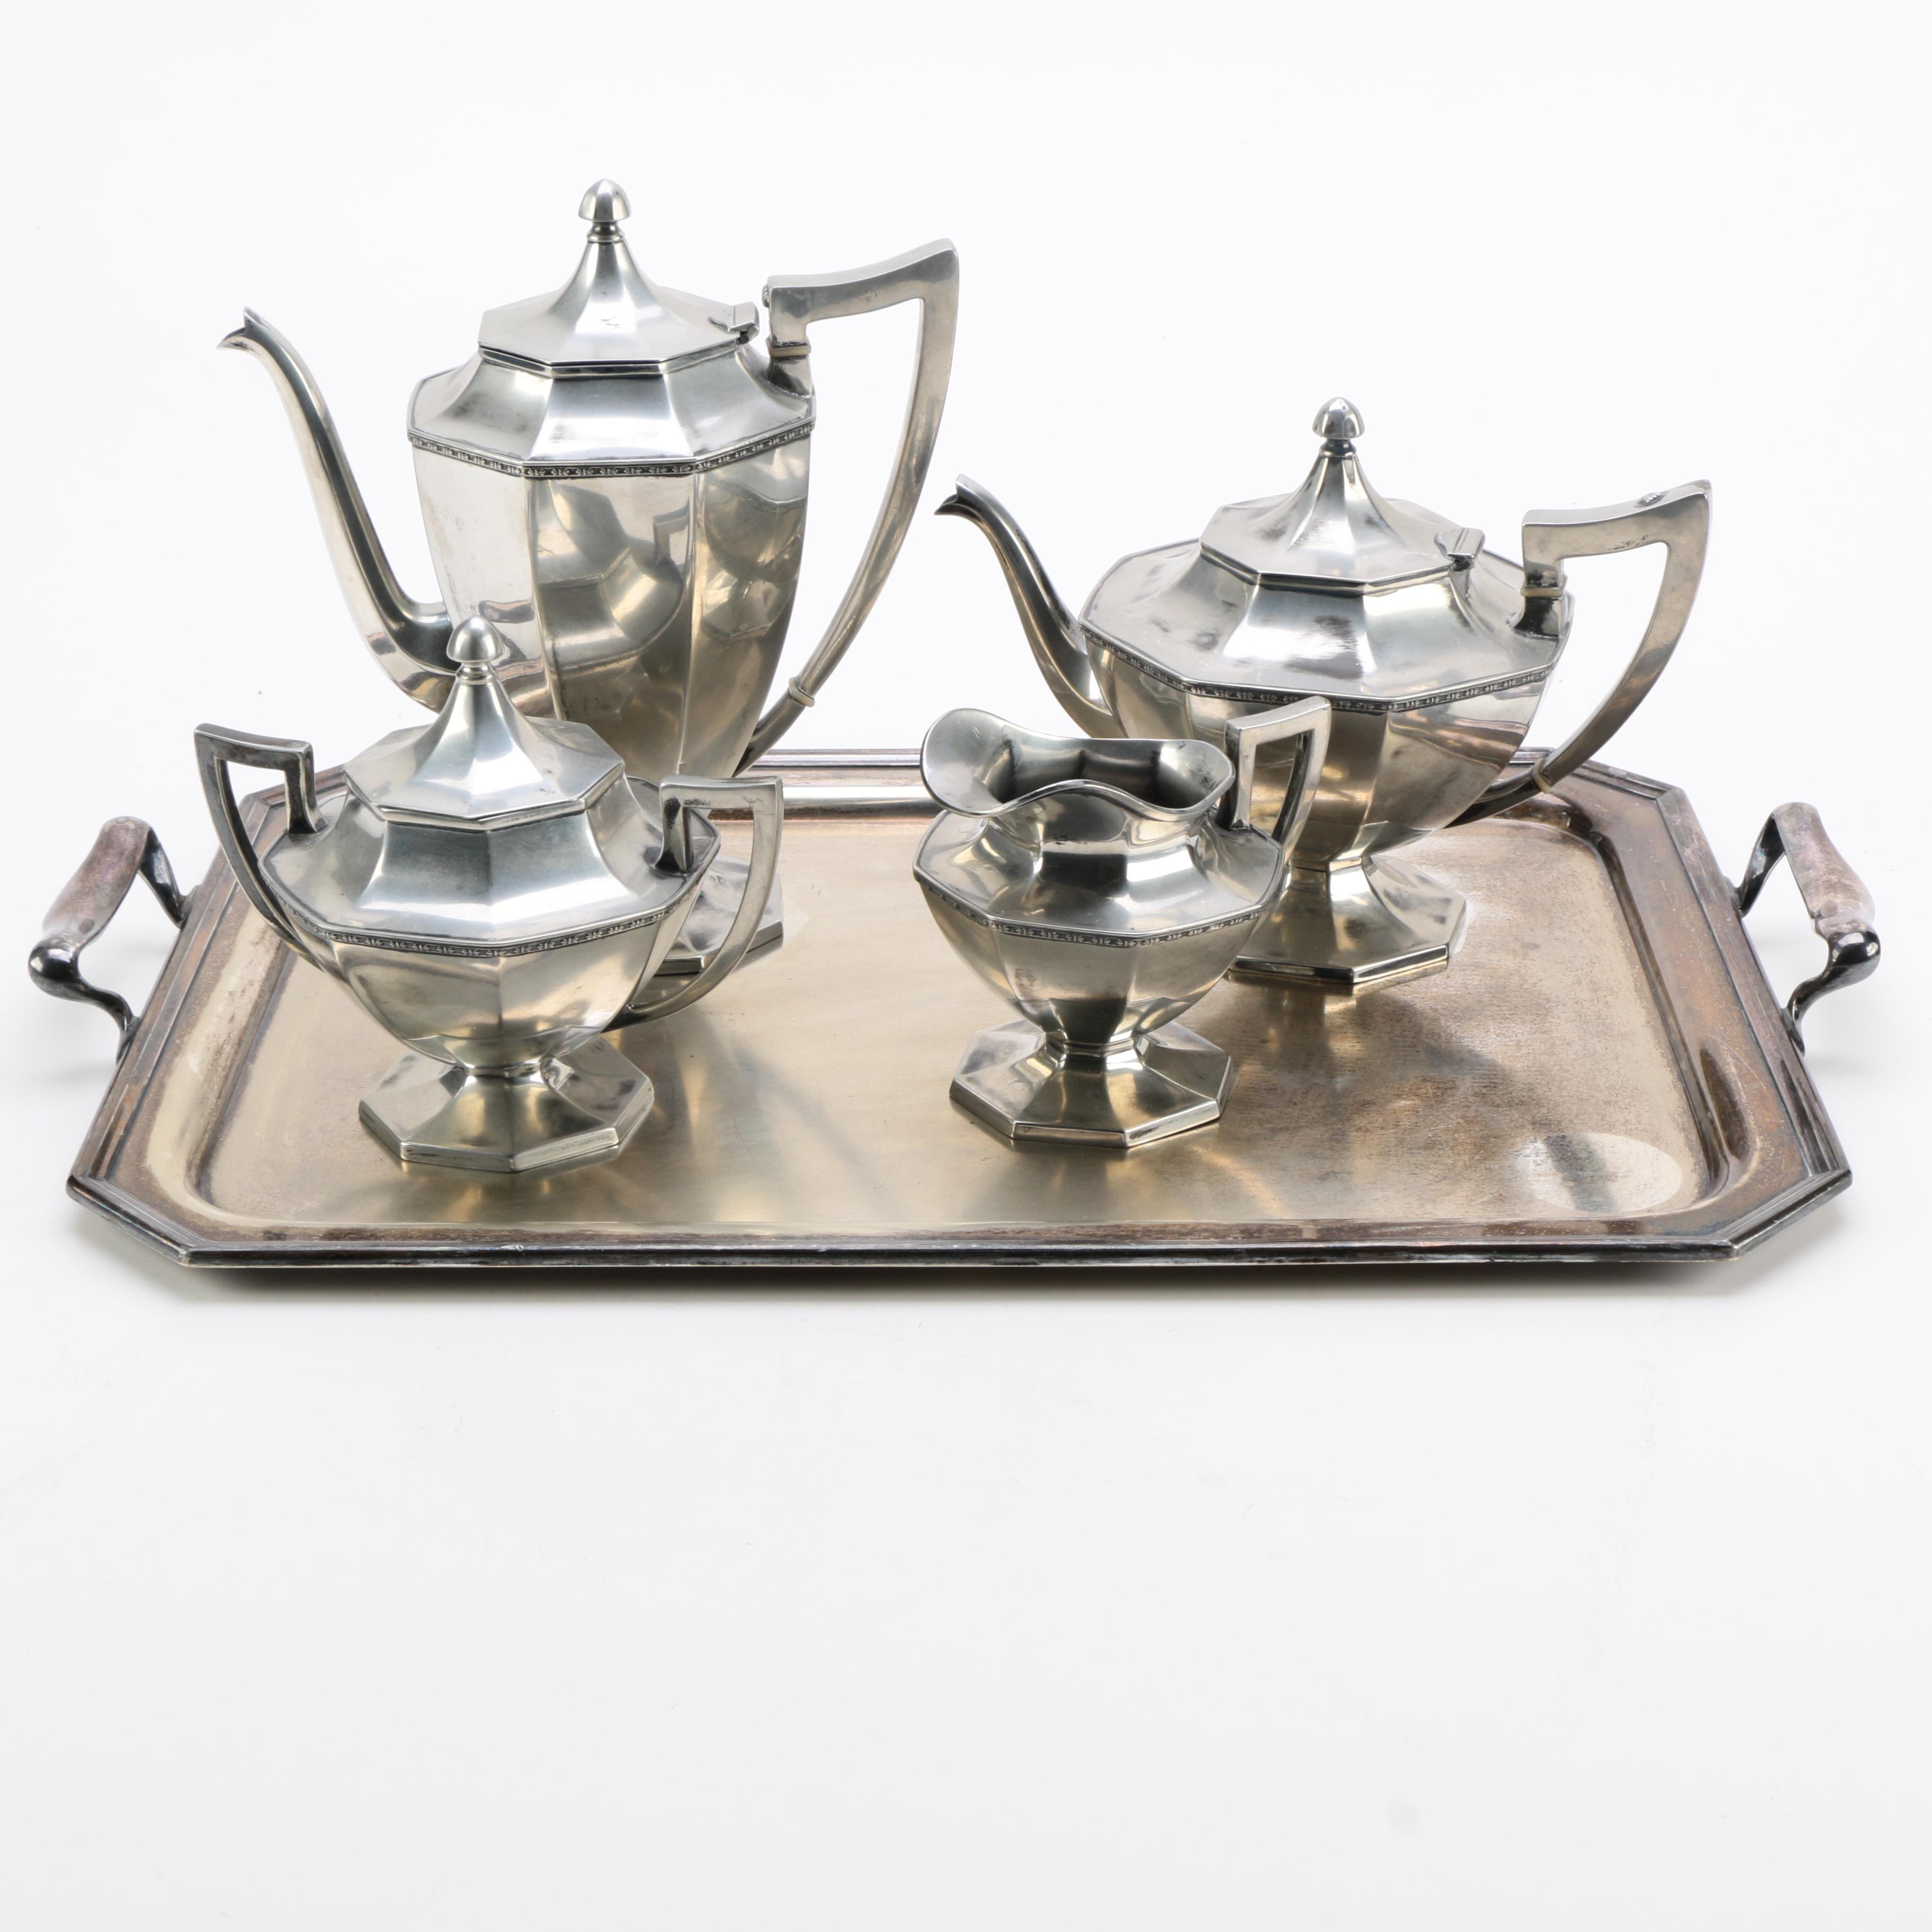 Wilcox Silver Plate Co. Silver Plate Tea and Coffee Service